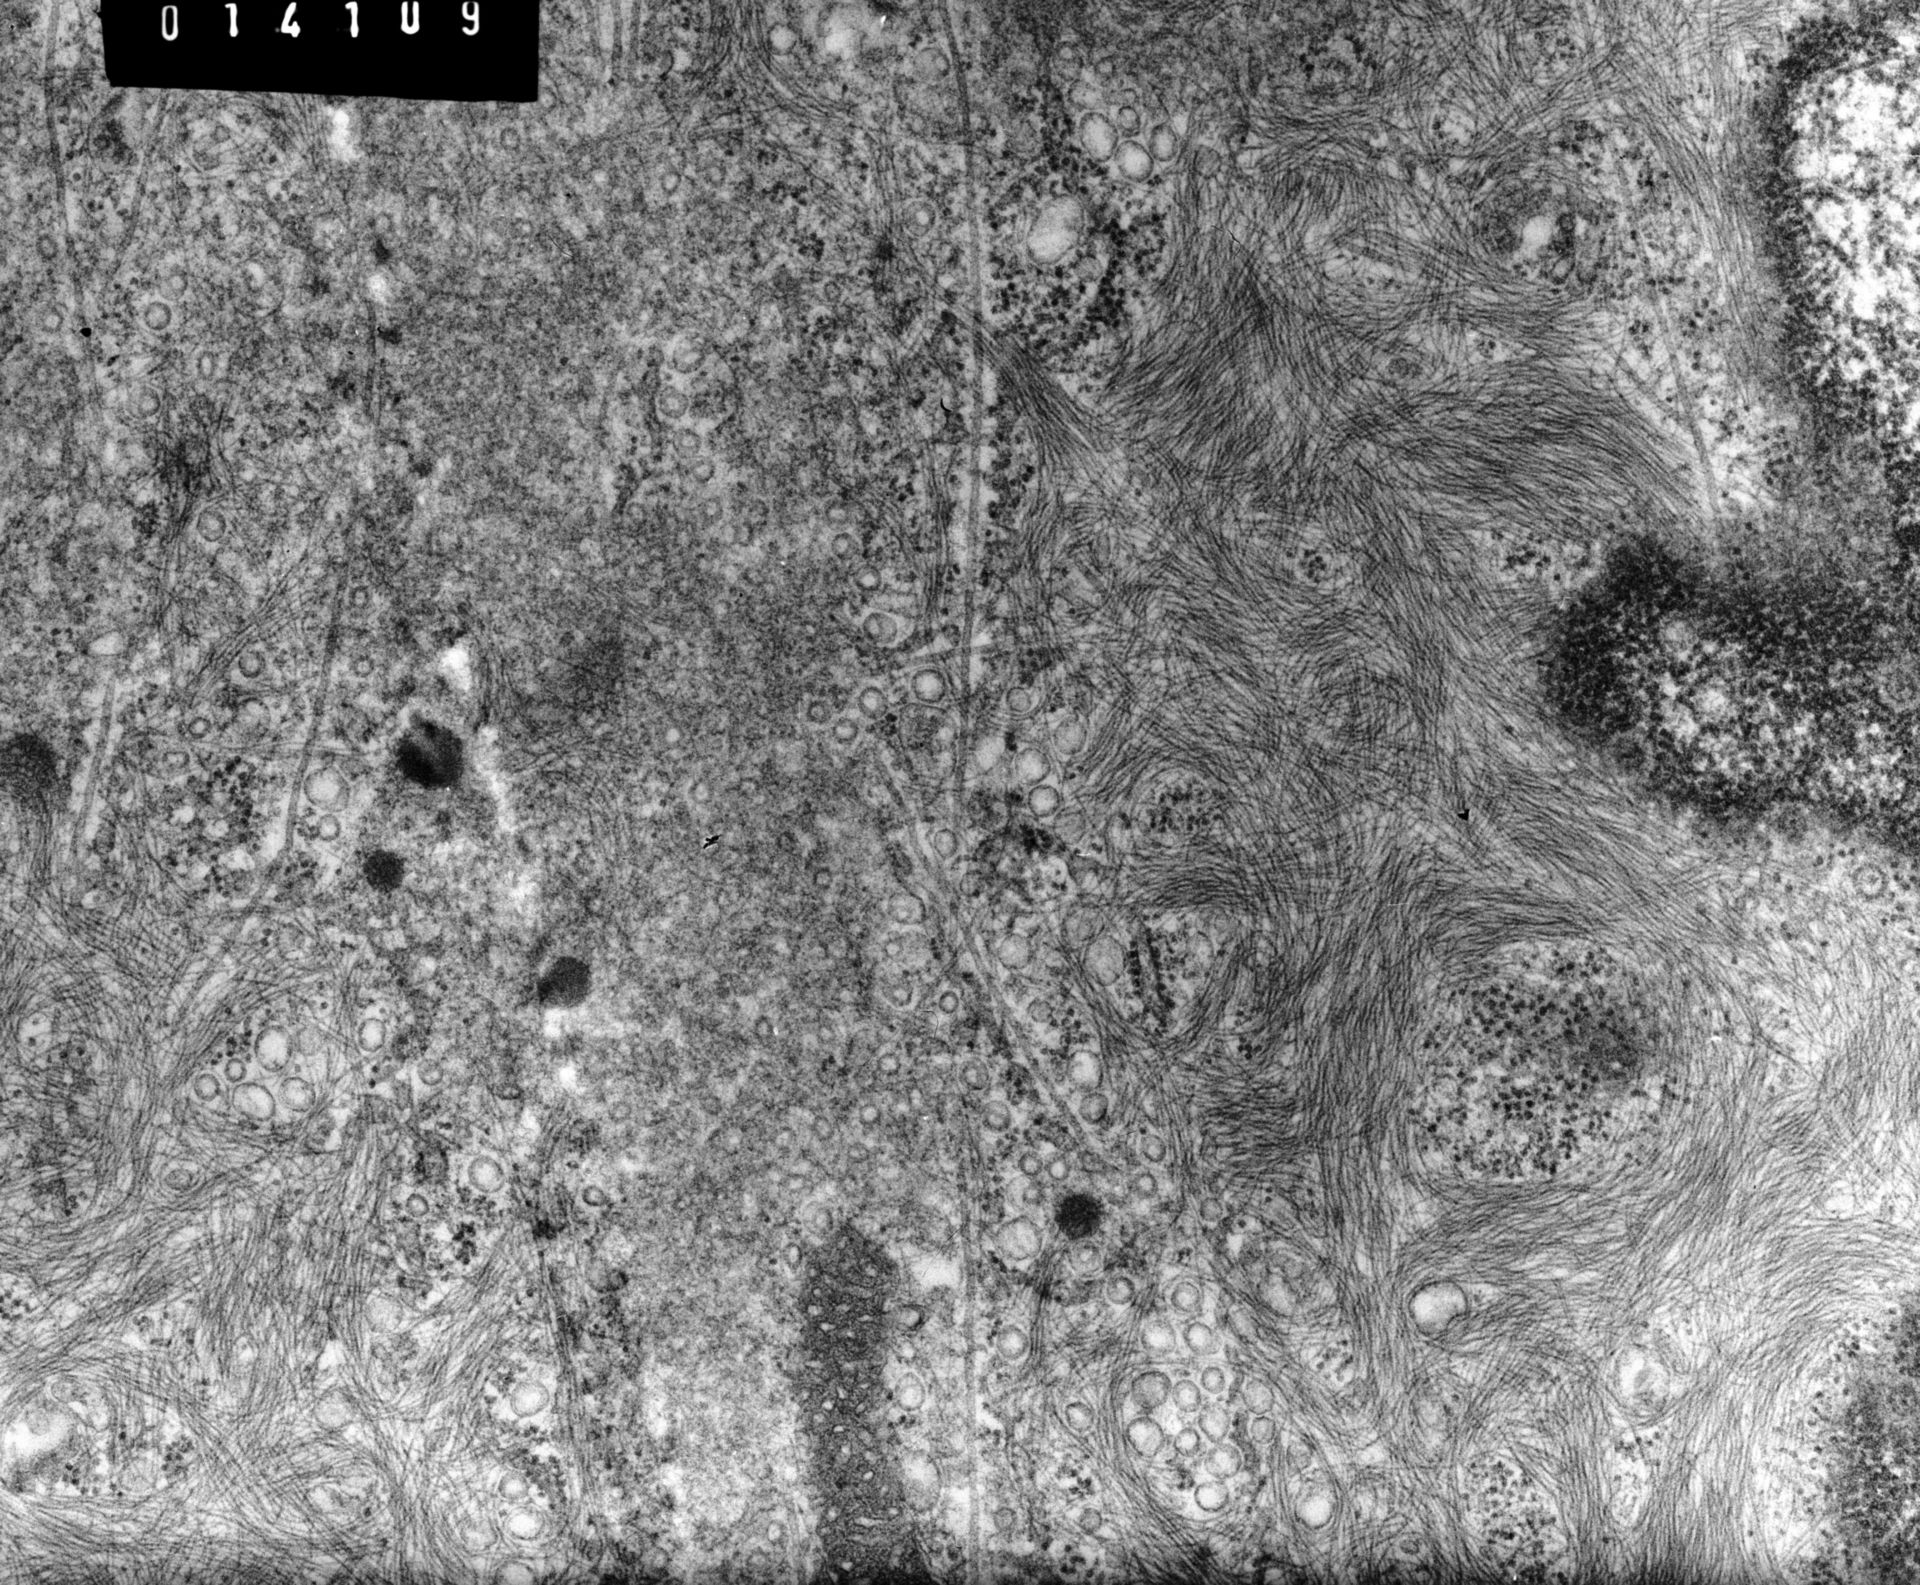 Rana catesbeiana (Plasma membrane) - CIL:10002